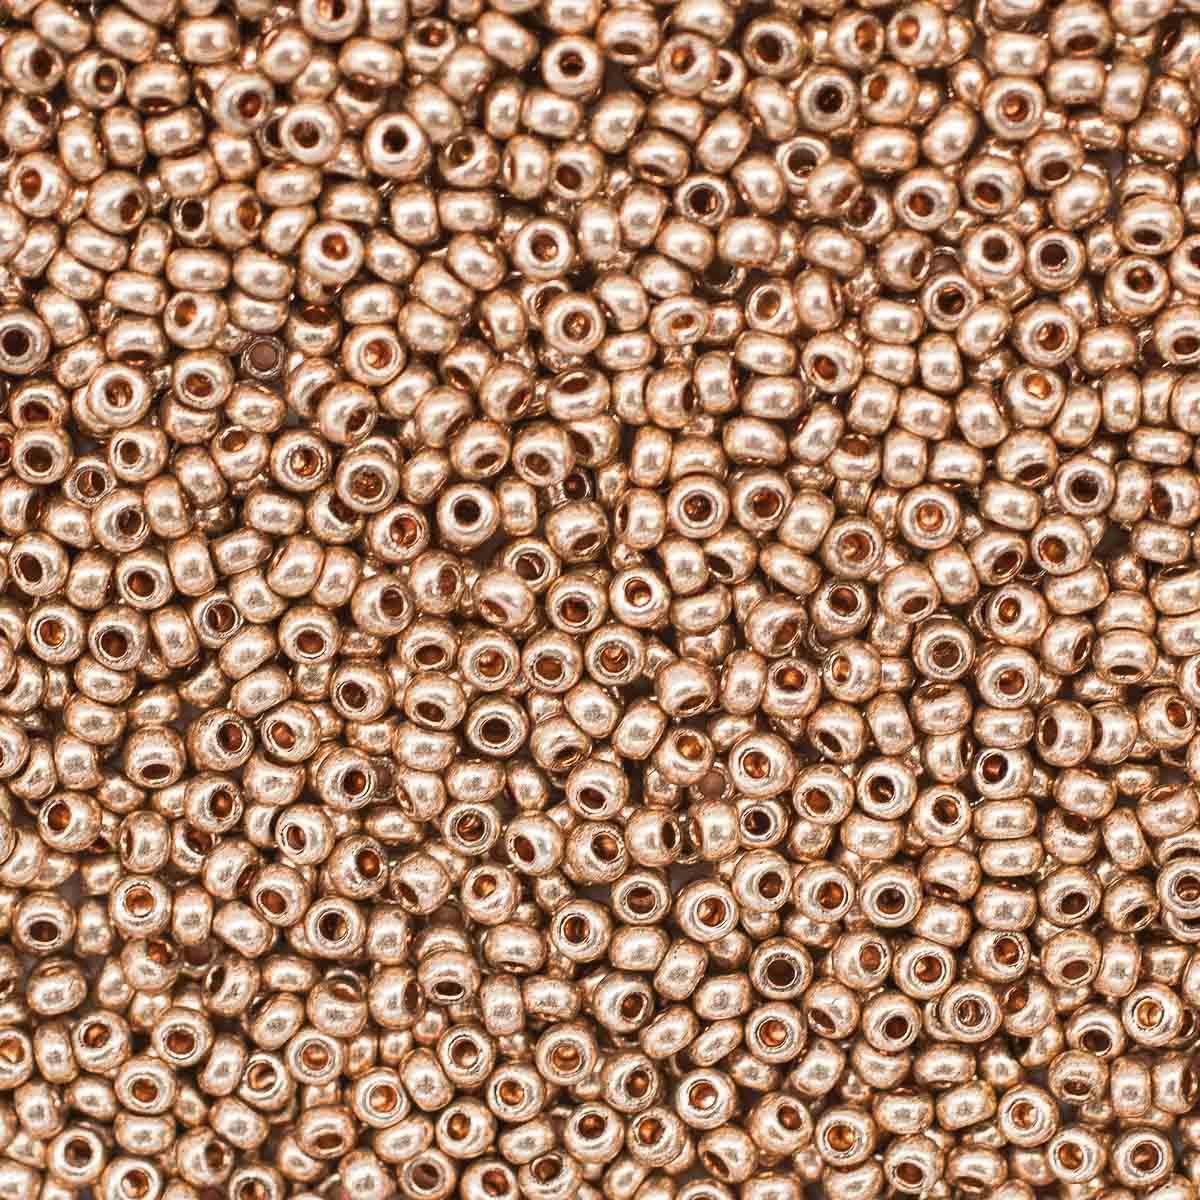 331-19001-10/0-18112 Бисер прозрачный solgel 10/0, круг. отв., 20 гр., Preciosa